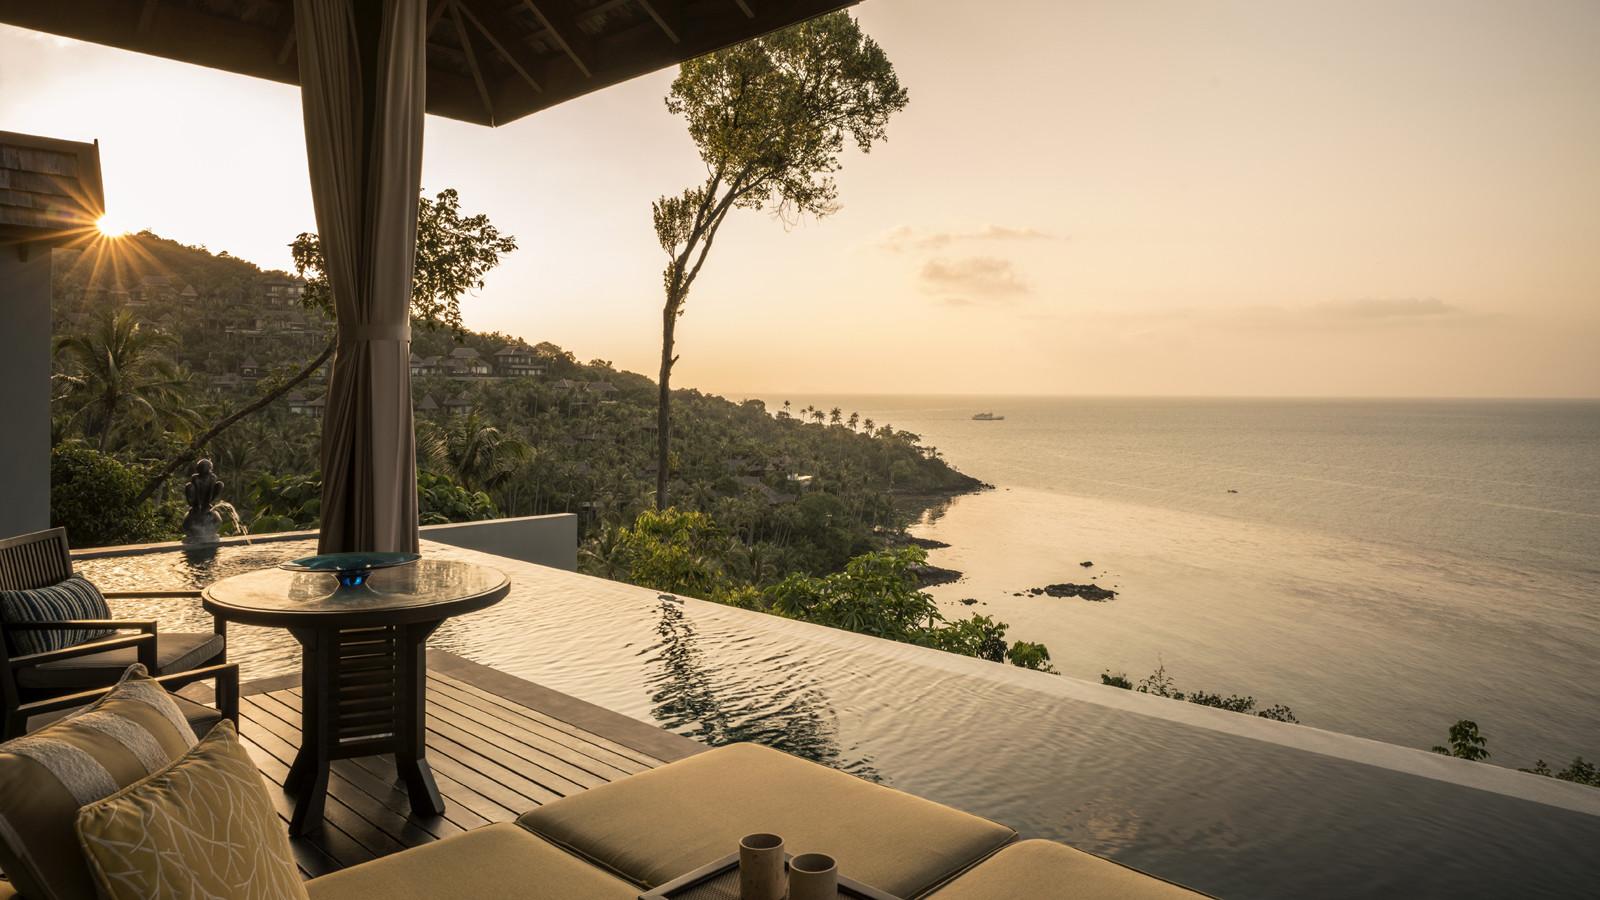 news-main-international-travellers-welcome-to-experience-thailands-island-life-at-four-seasons-resort-koh-samui.1634313131.jpg